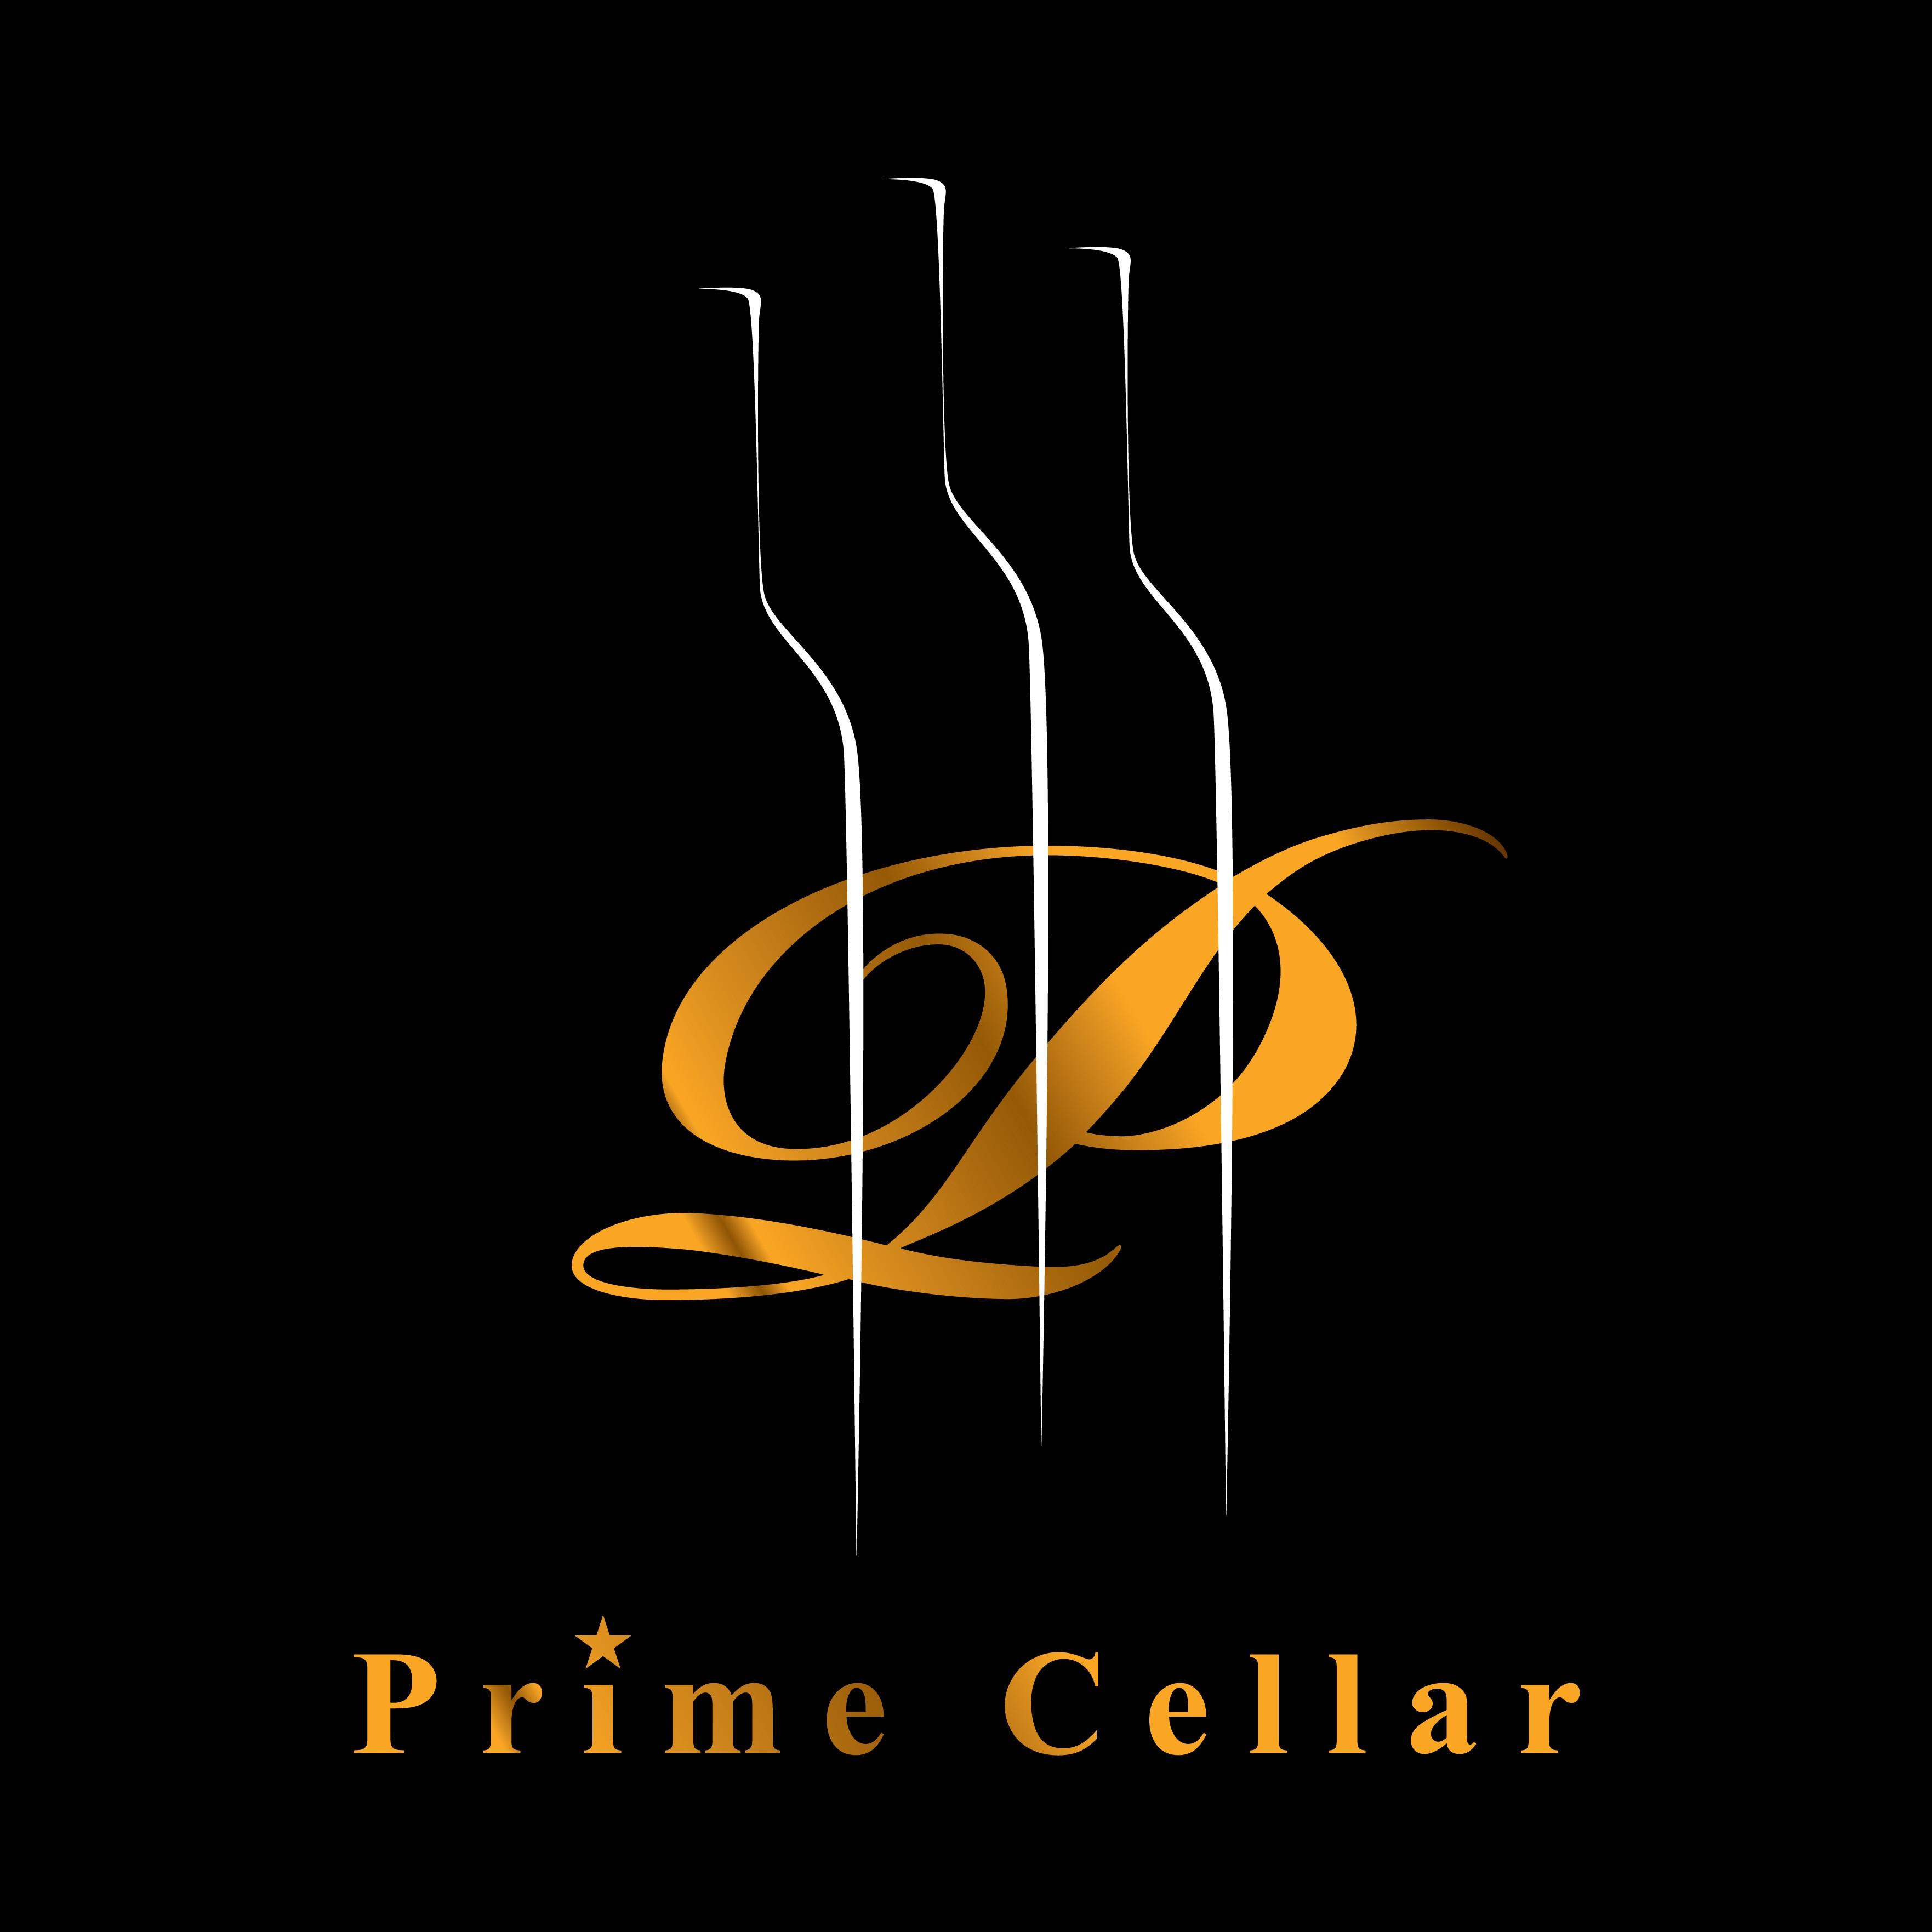 PCR-Logo-Square-Fine-3525x3525.jpg